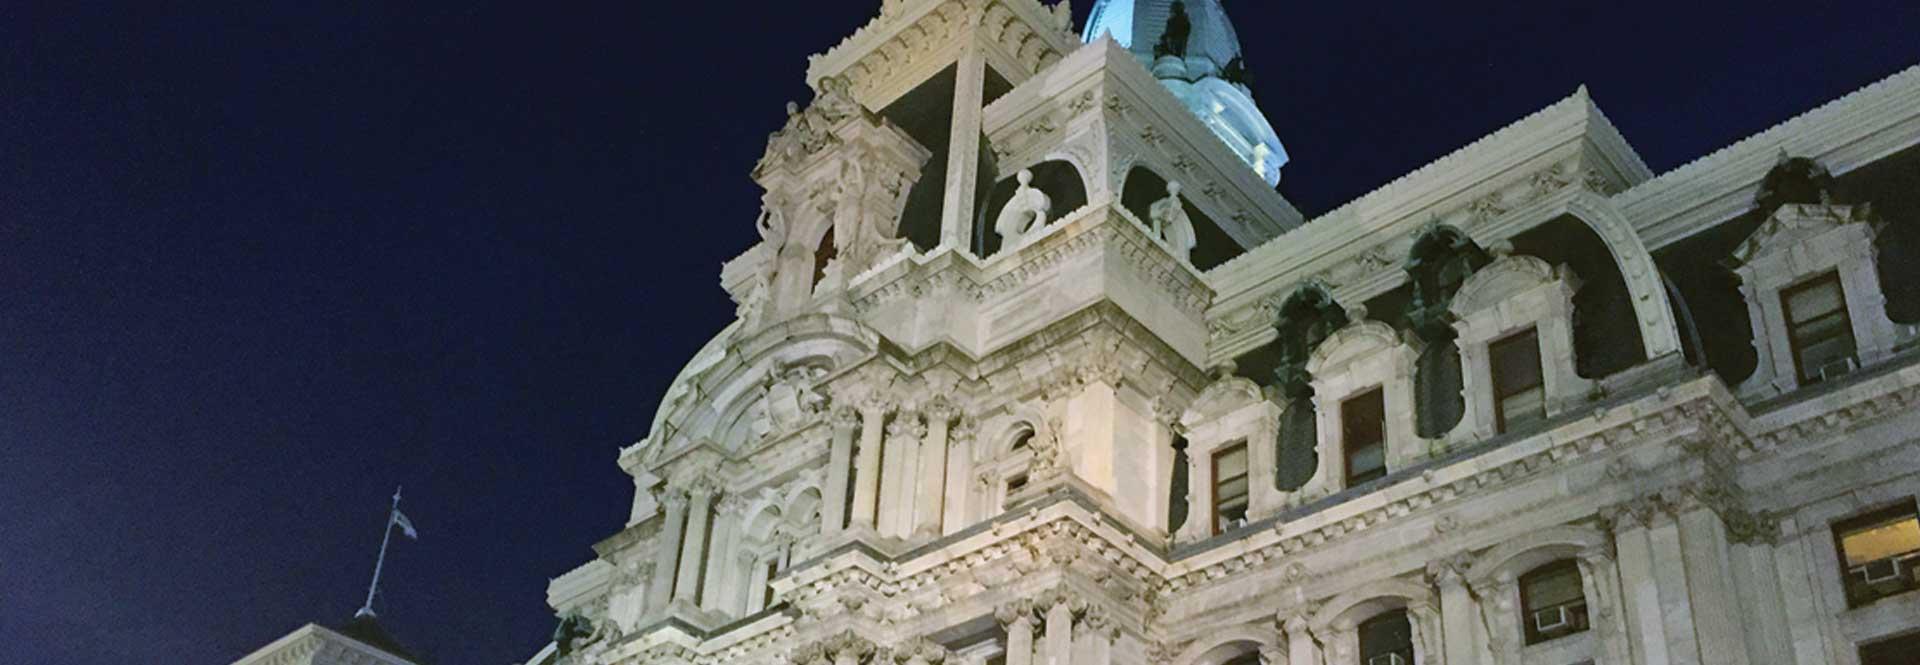 Raising property taxes on over-burdened homeowners is a bad idea! Photo: Linn Washington Jr.